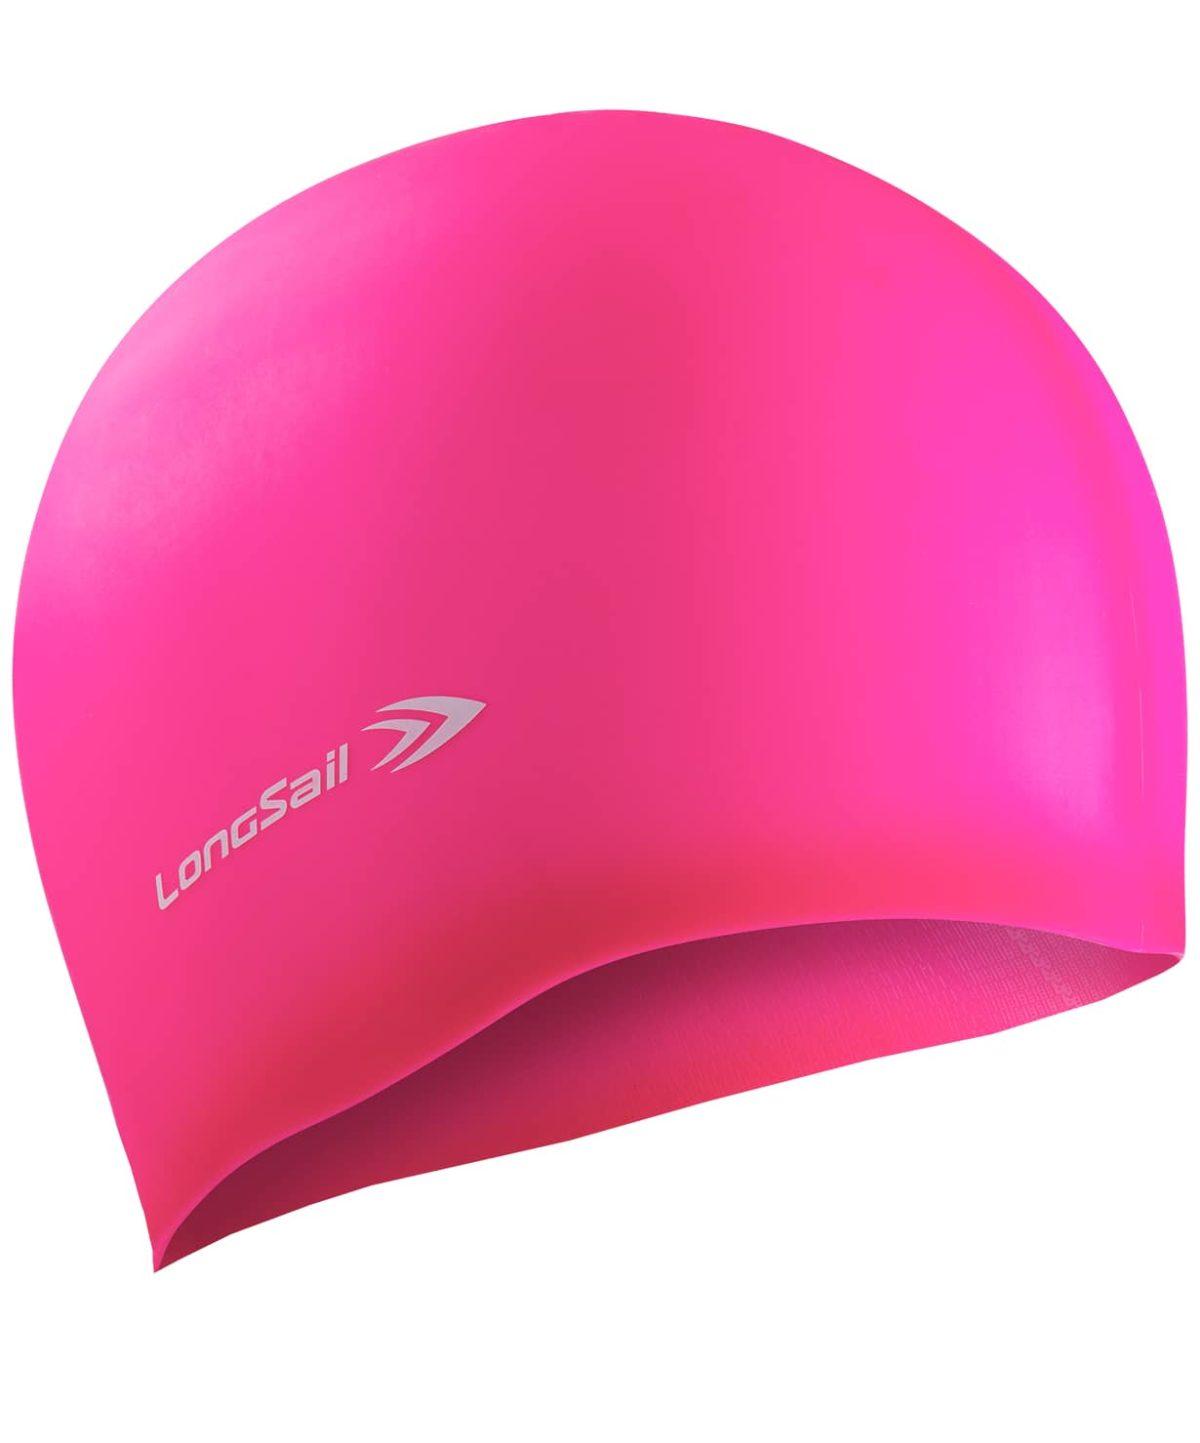 LONGSAIL  Шапочка для плавания силикон: розовый - 1